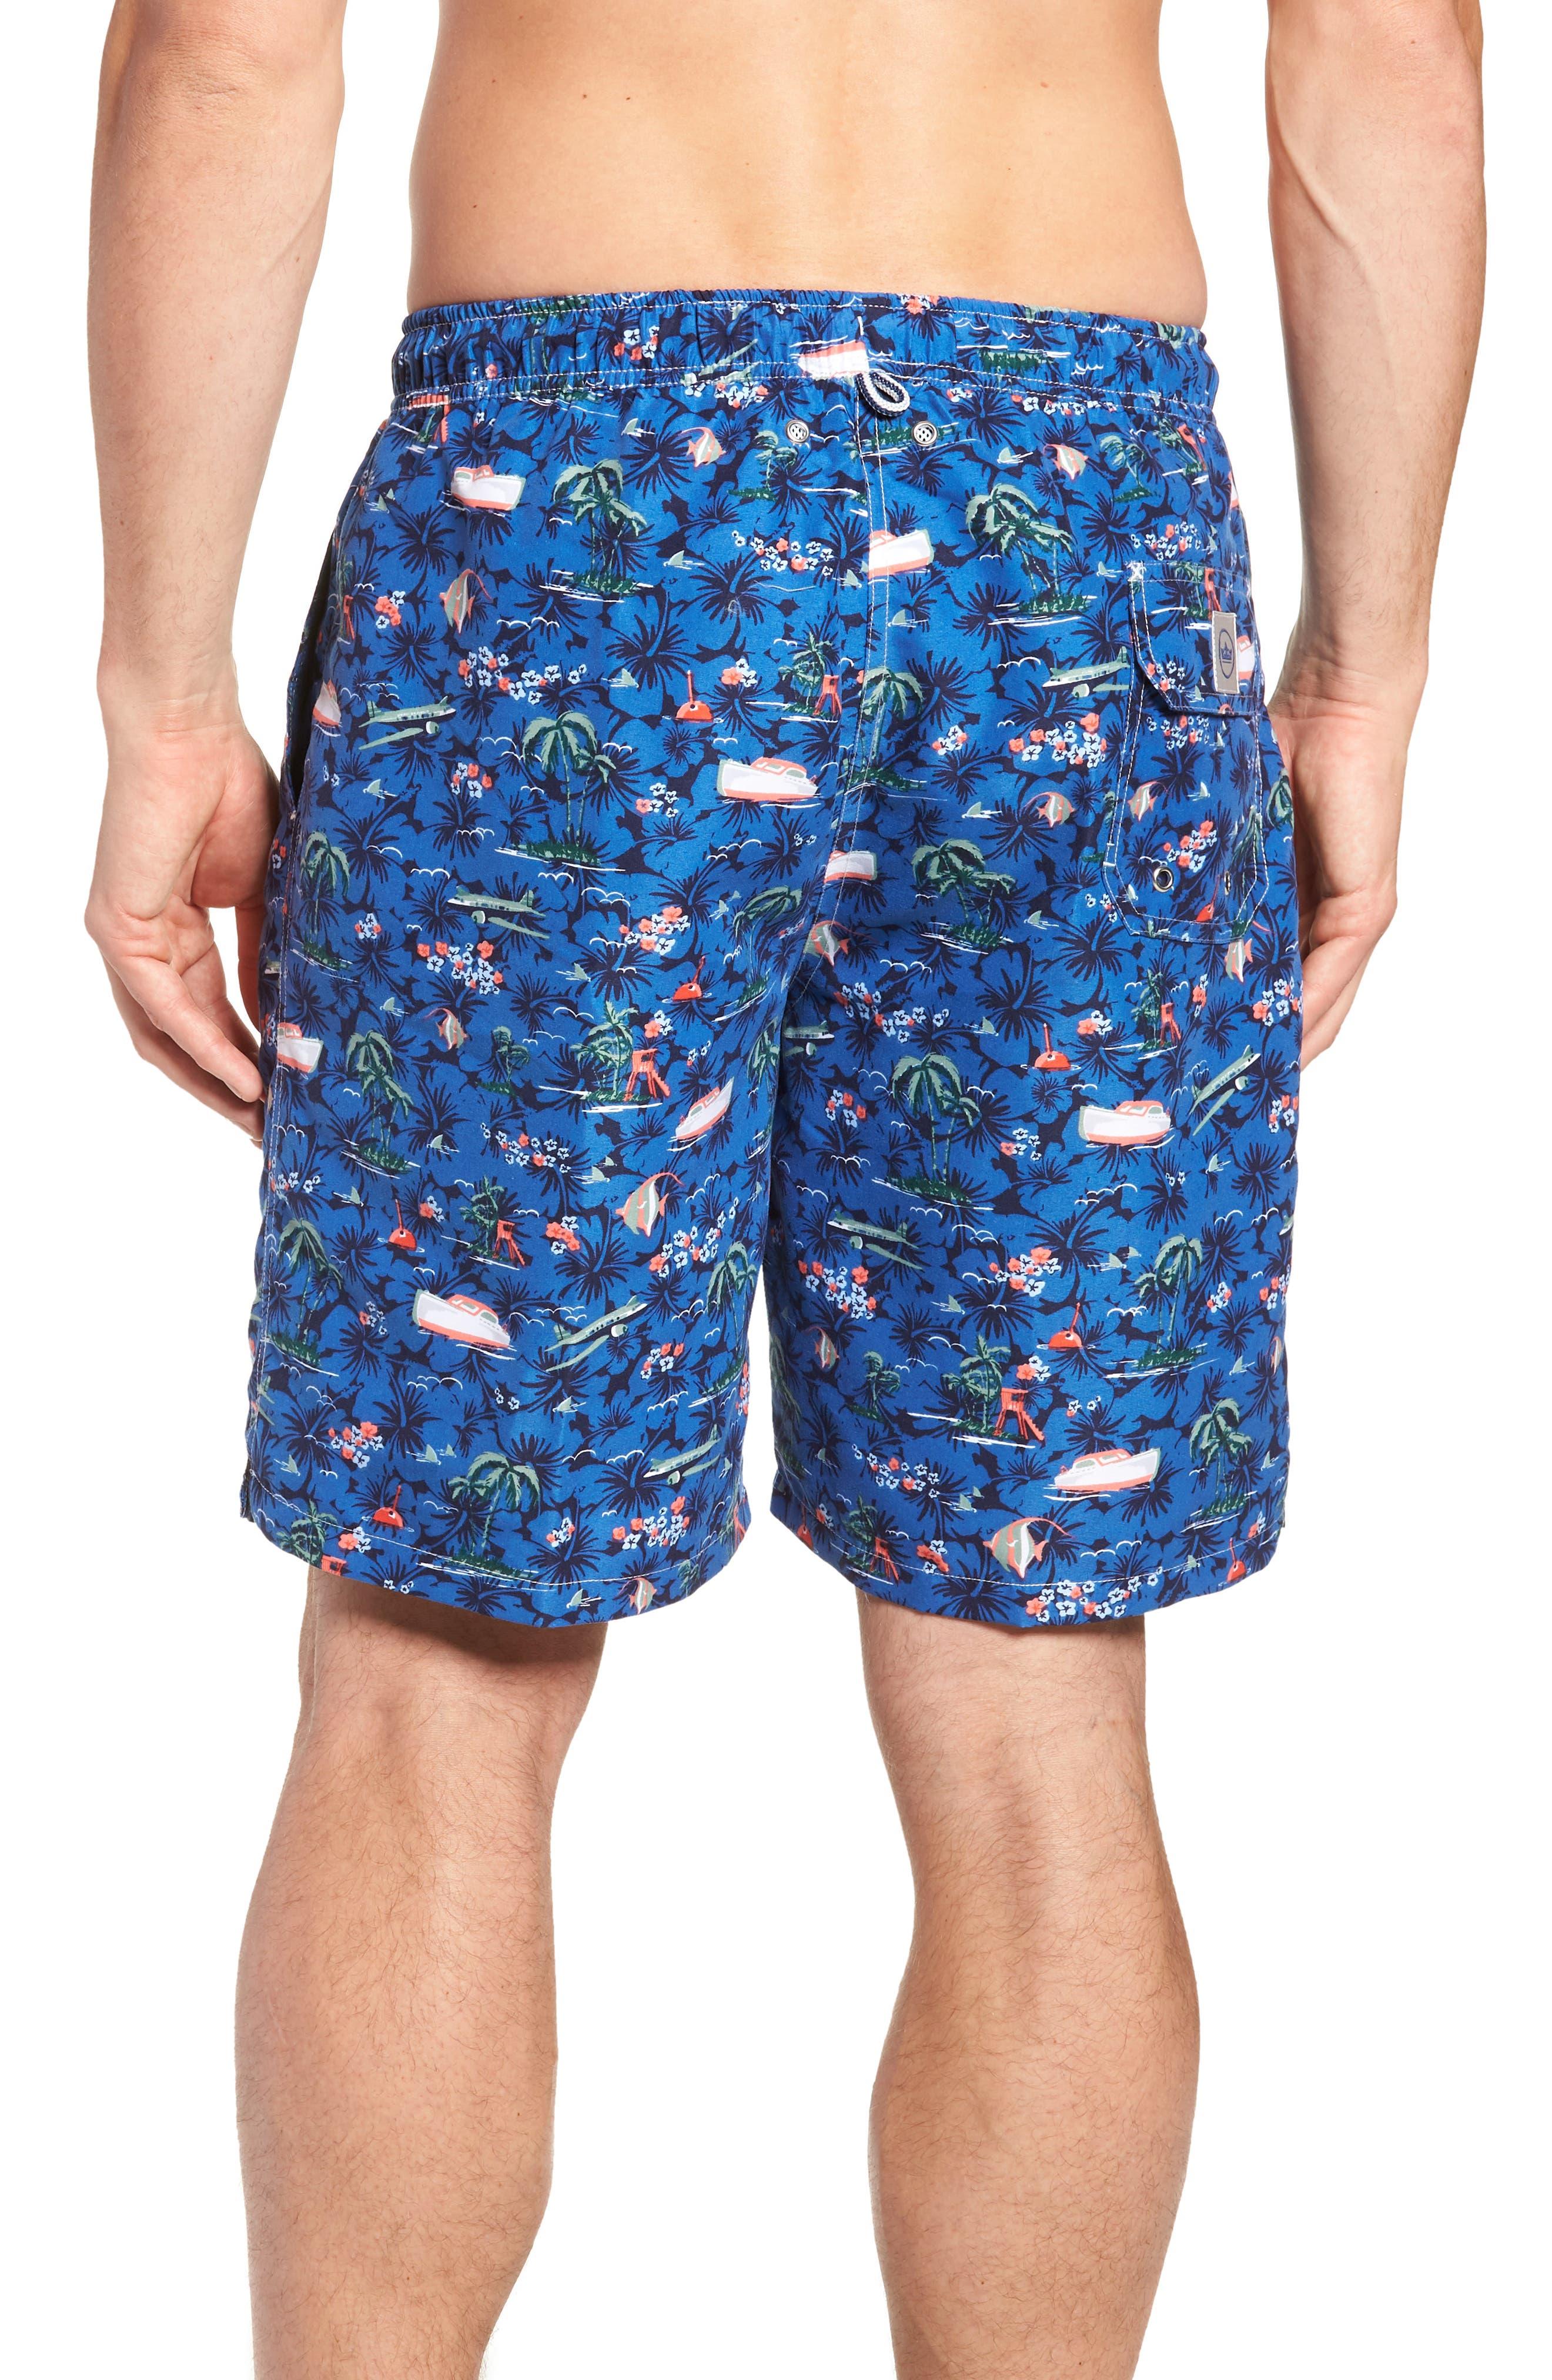 Hawaiian Express Swim Trunks,                             Alternate thumbnail 2, color,                             BLUE